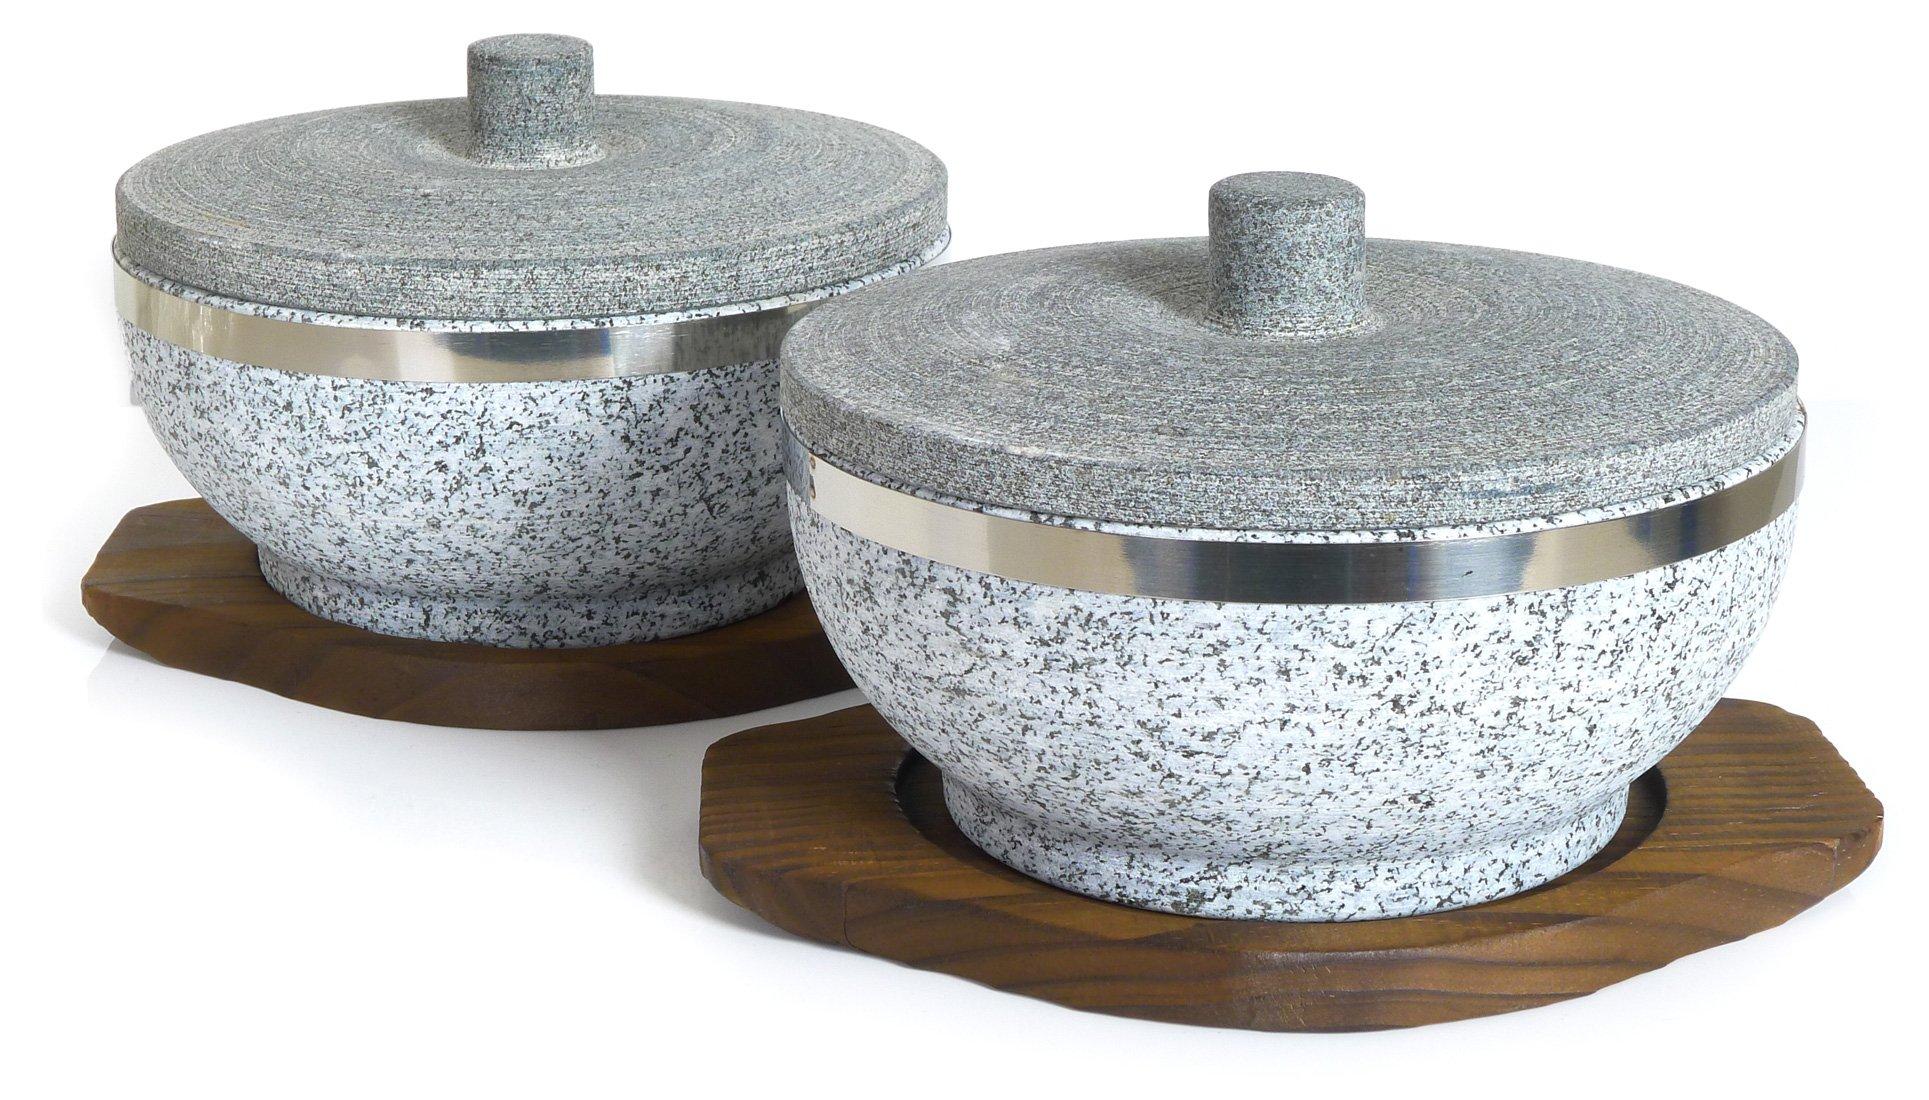 Spiceberry Home Granite Dolsot Bibimbap Rice Bowl with Stone Lid - Set of 2